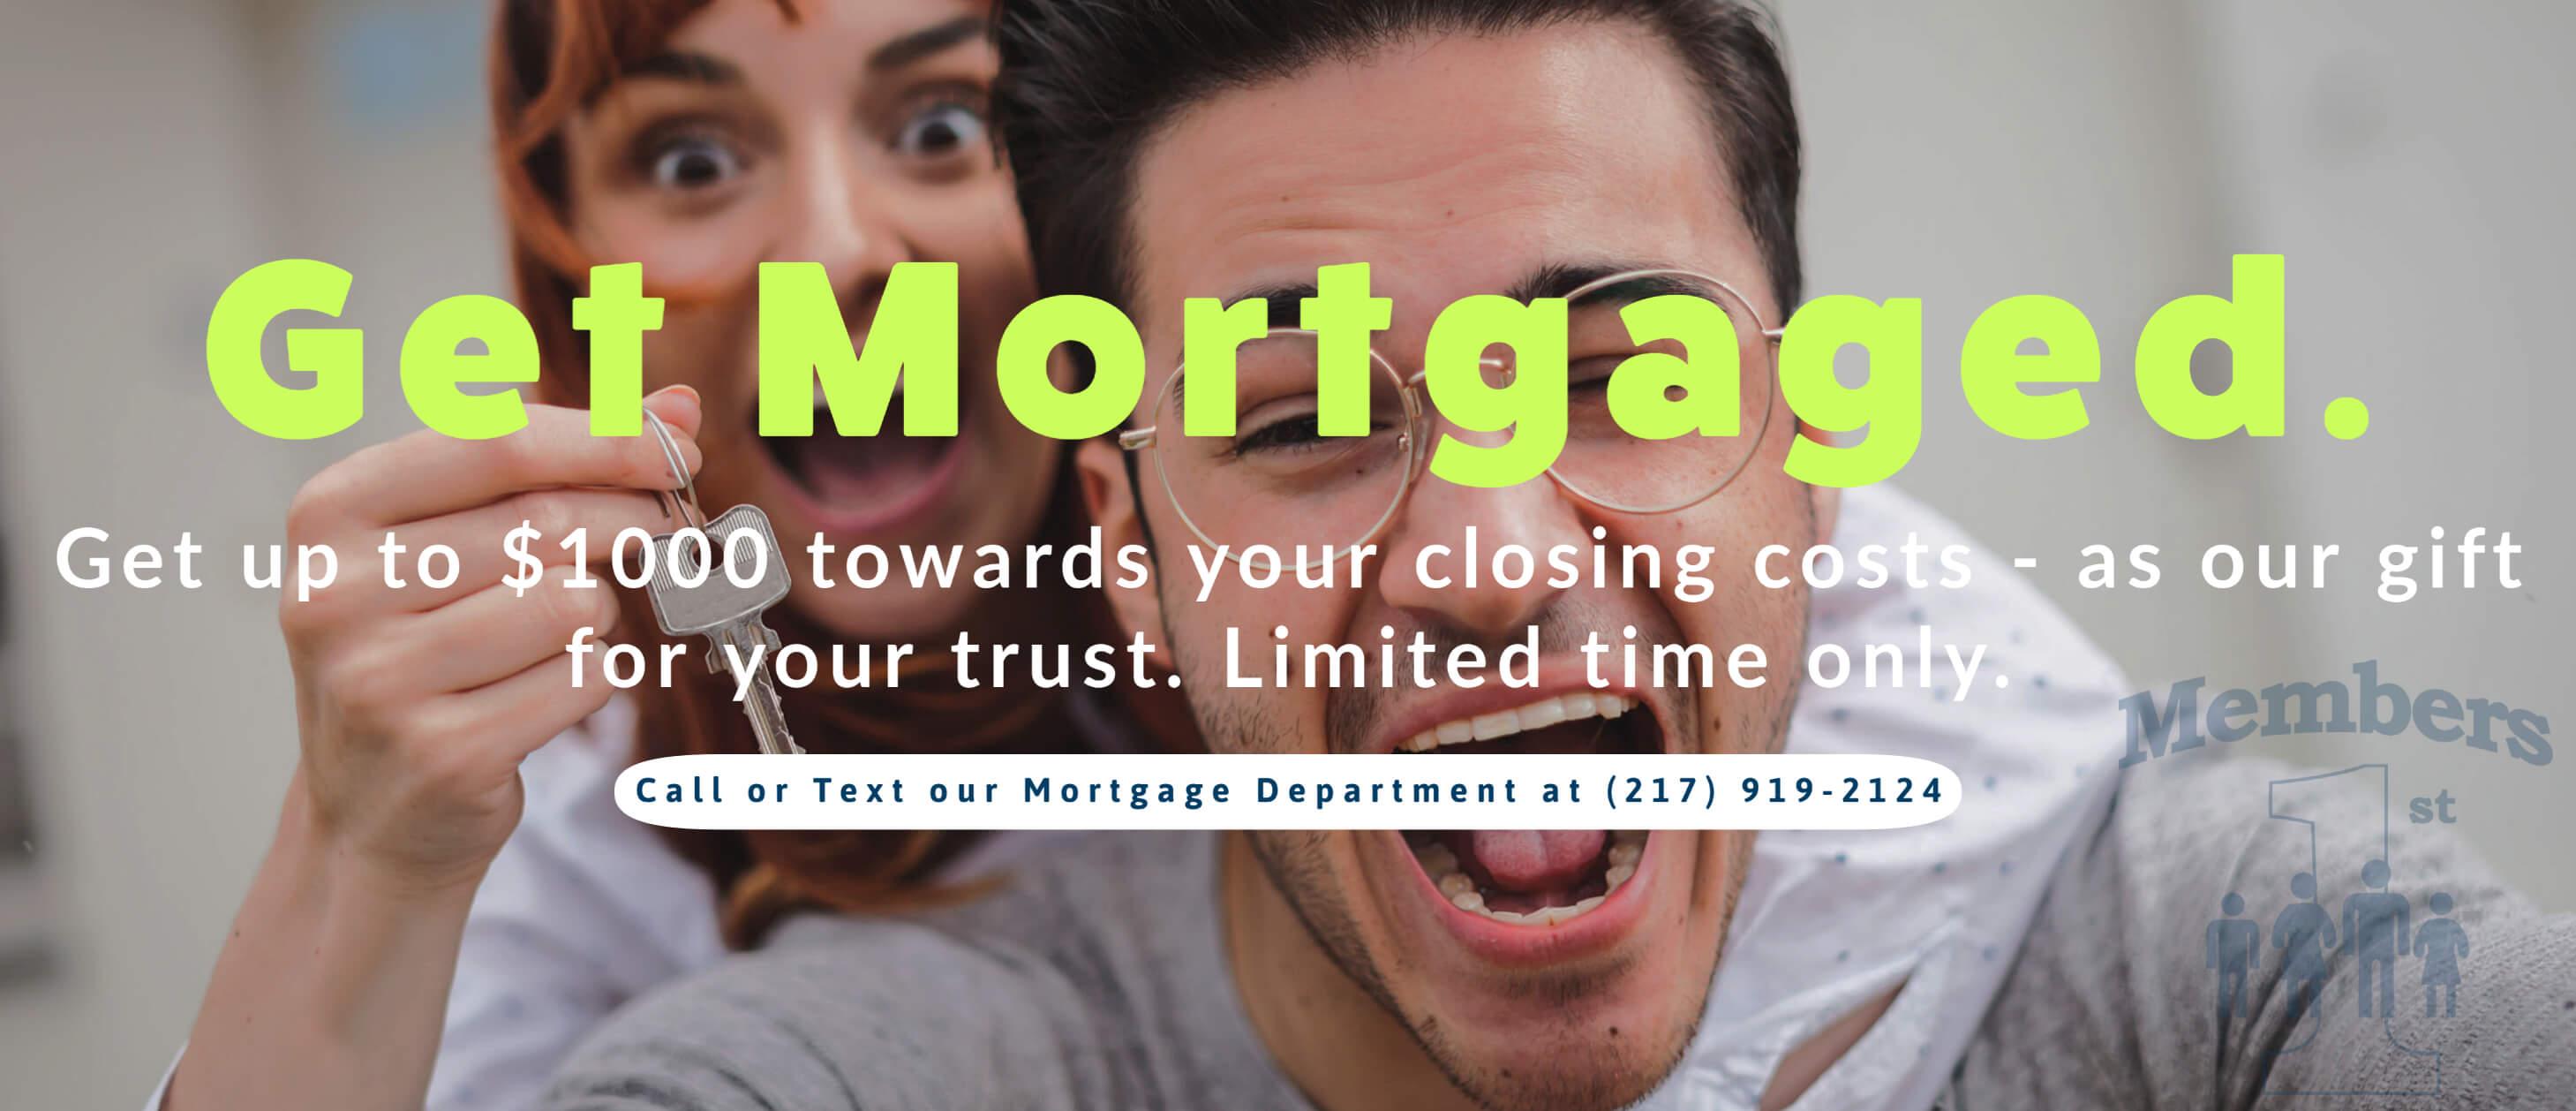 Get Mortgaged.